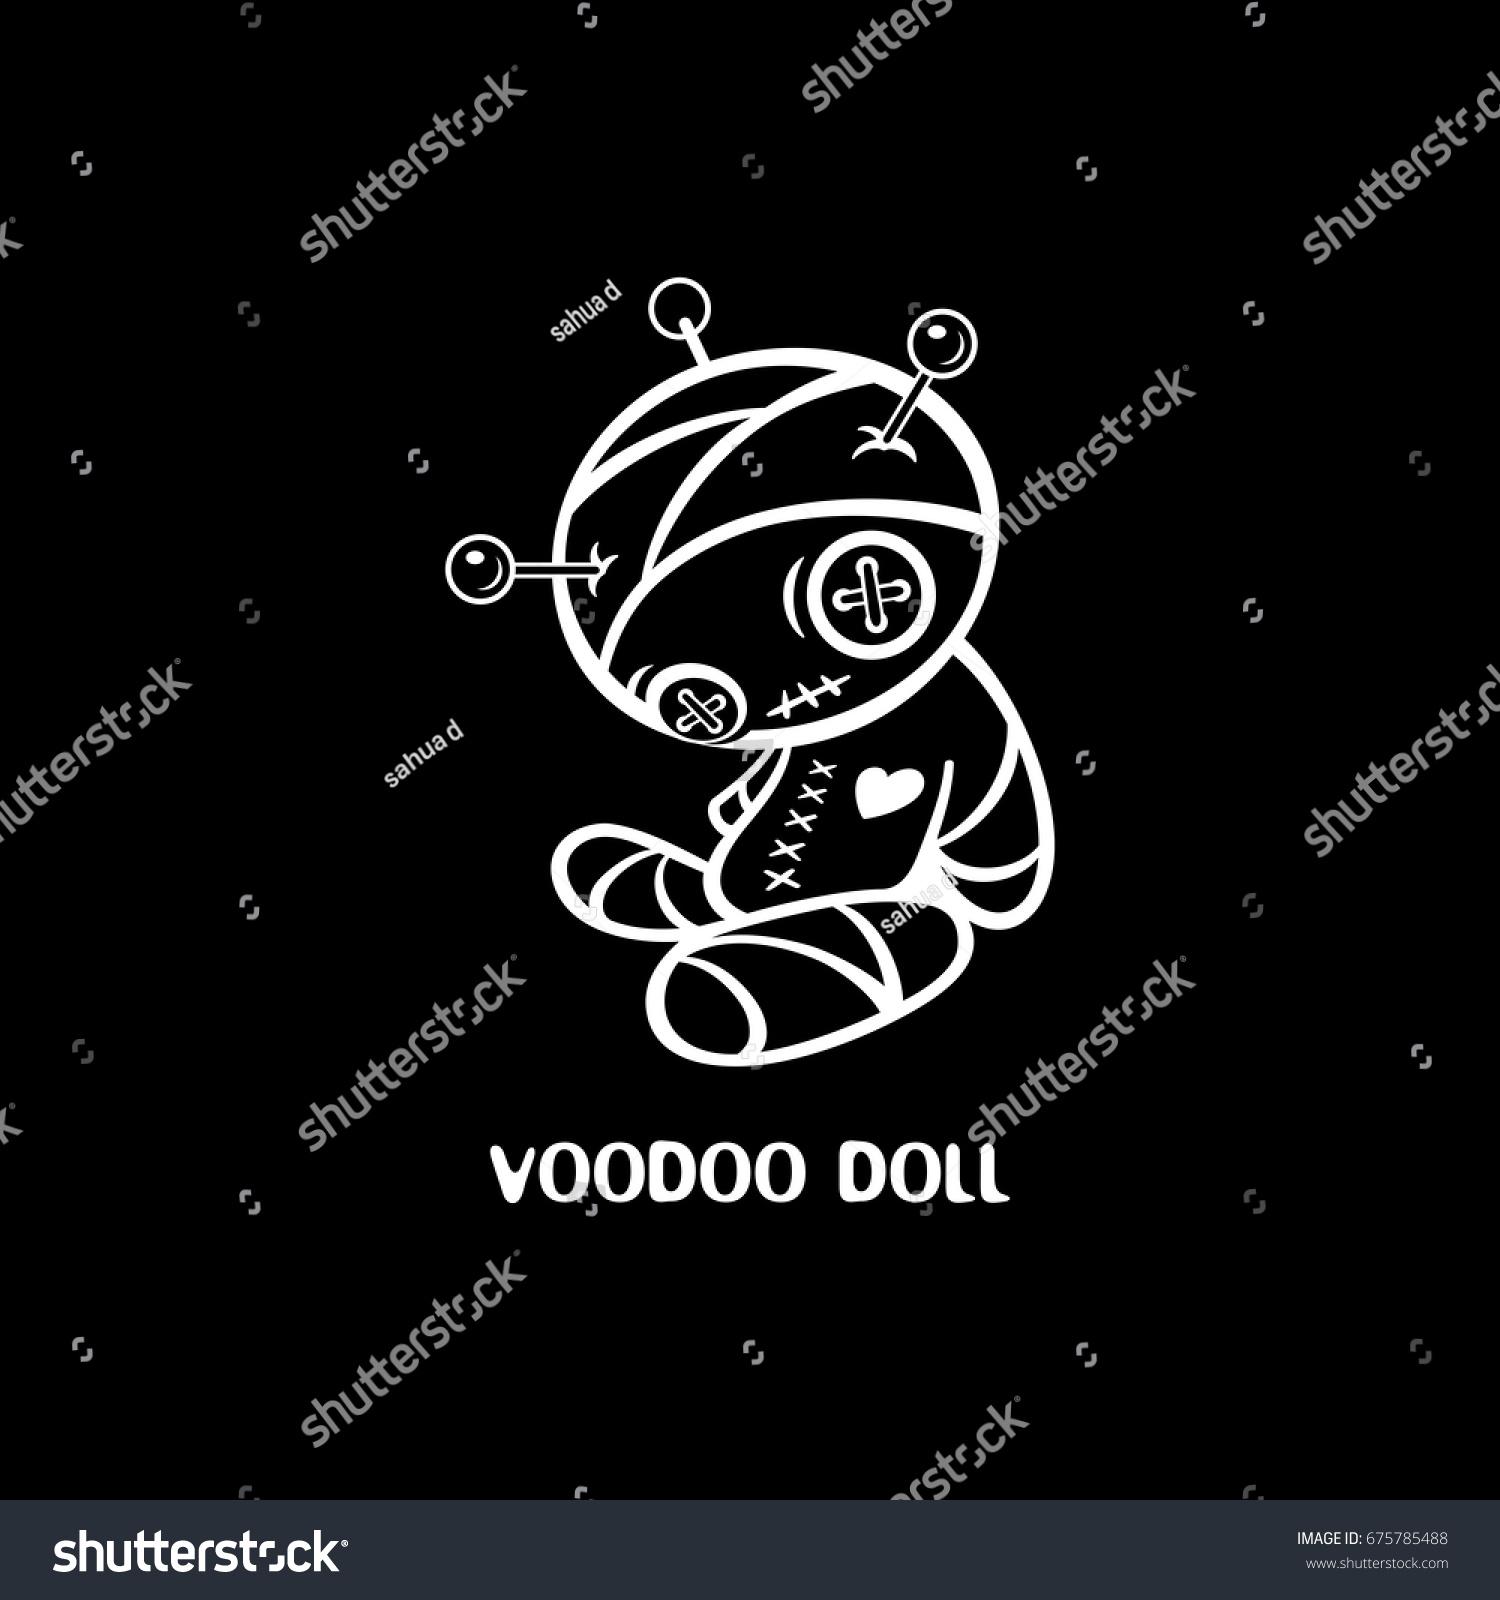 Black t shirt designs - Voodoo Doll Black T Shirt Design